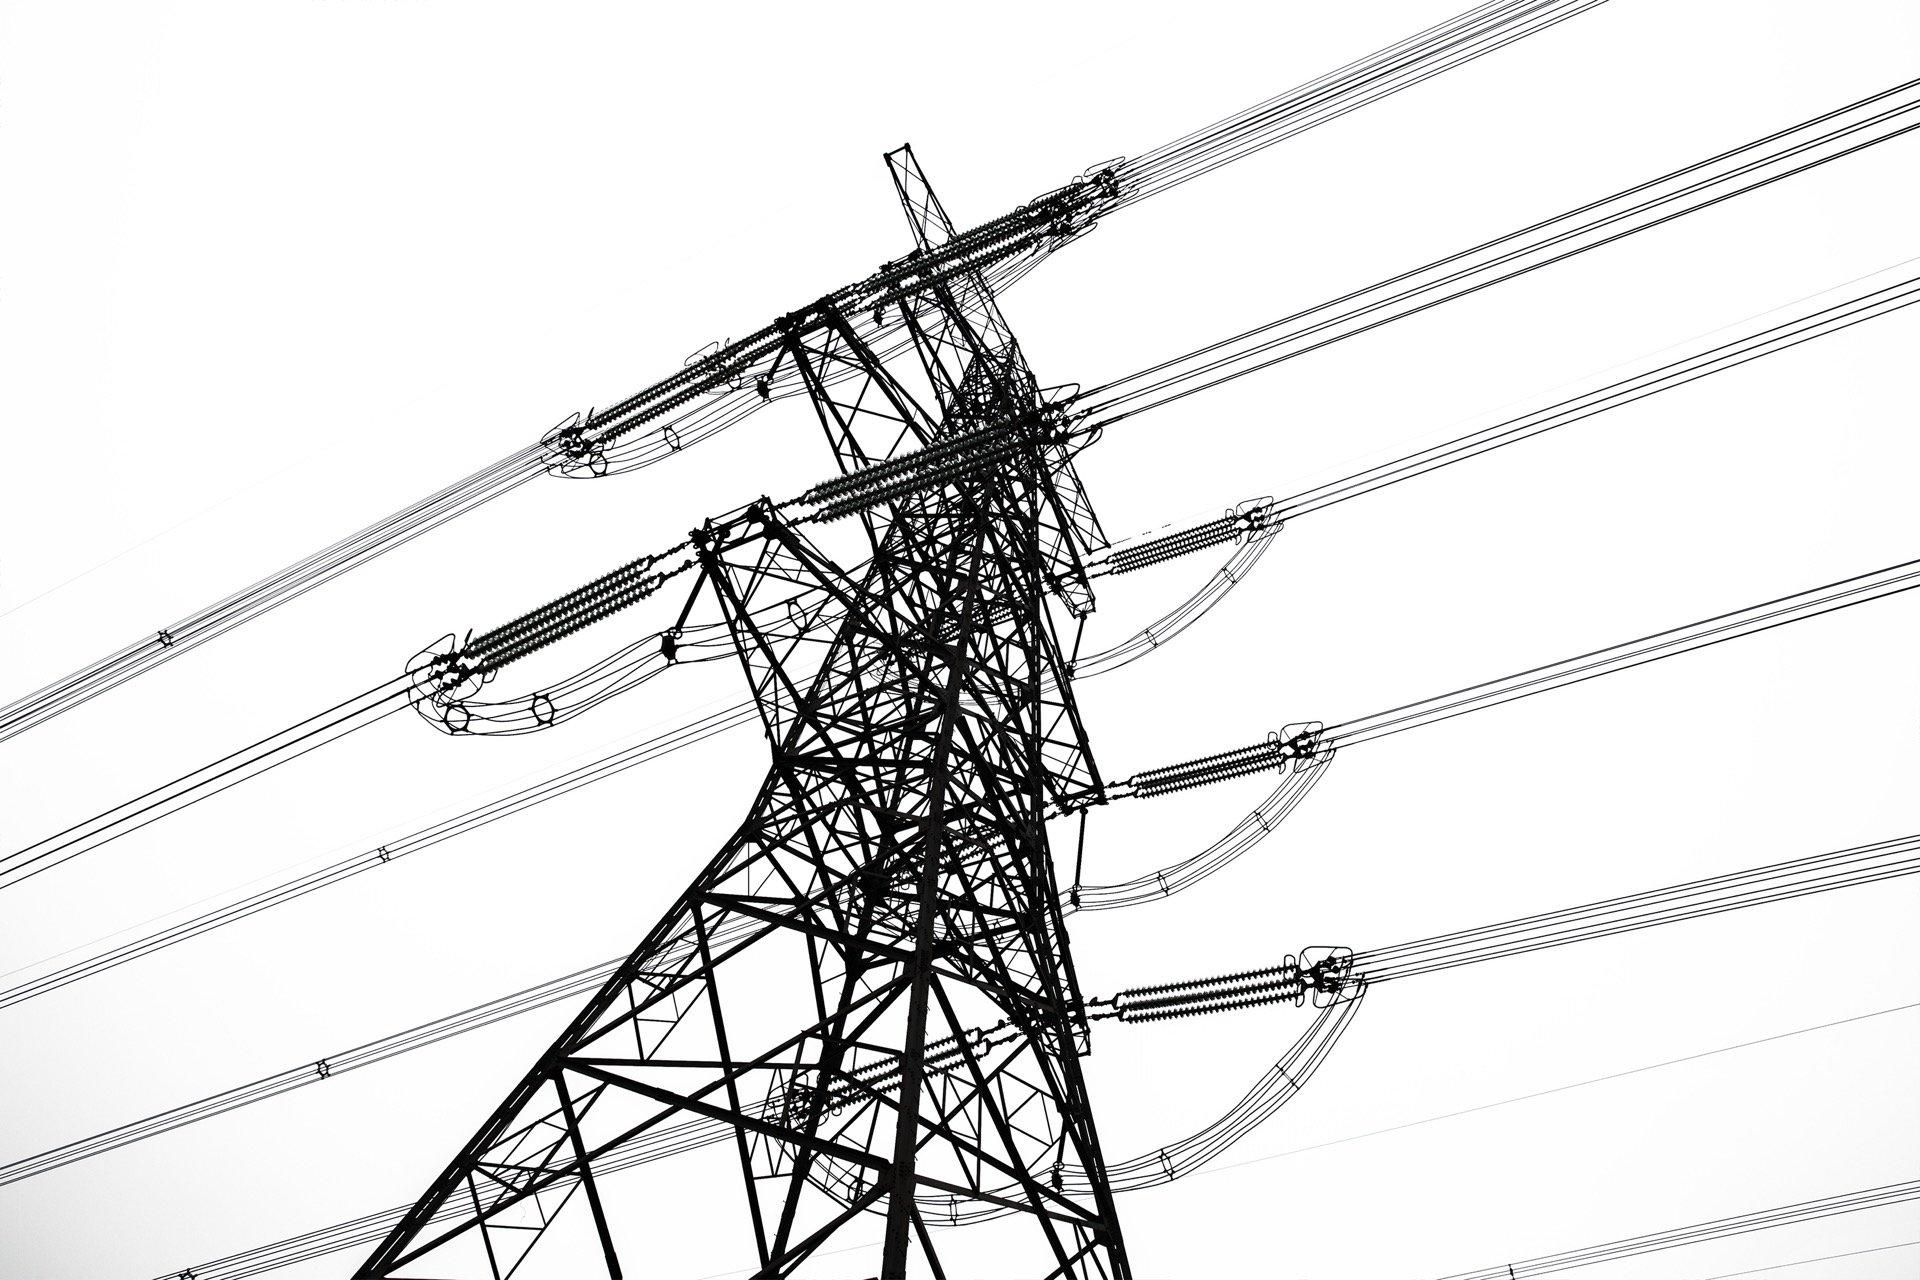 Aluminum power lines overhead